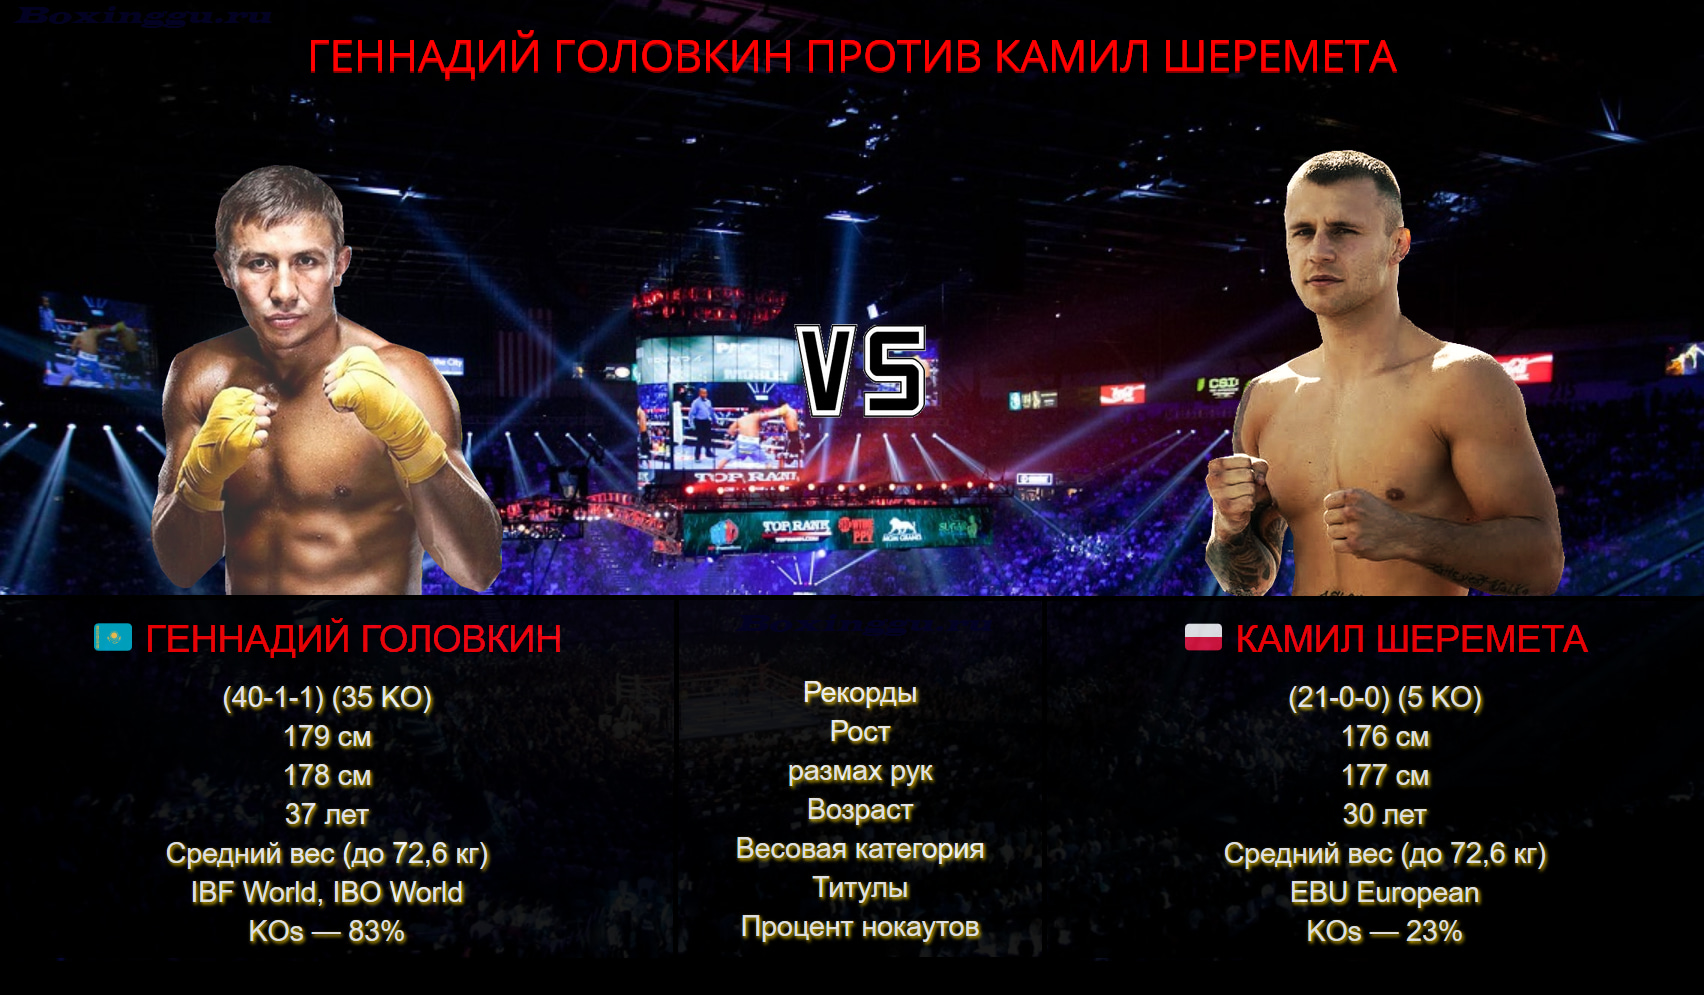 Афиша - бой: Геннадий Головкин - Камил Шеремета / Gennadiy Golovkin vs Kamil Szeremeta